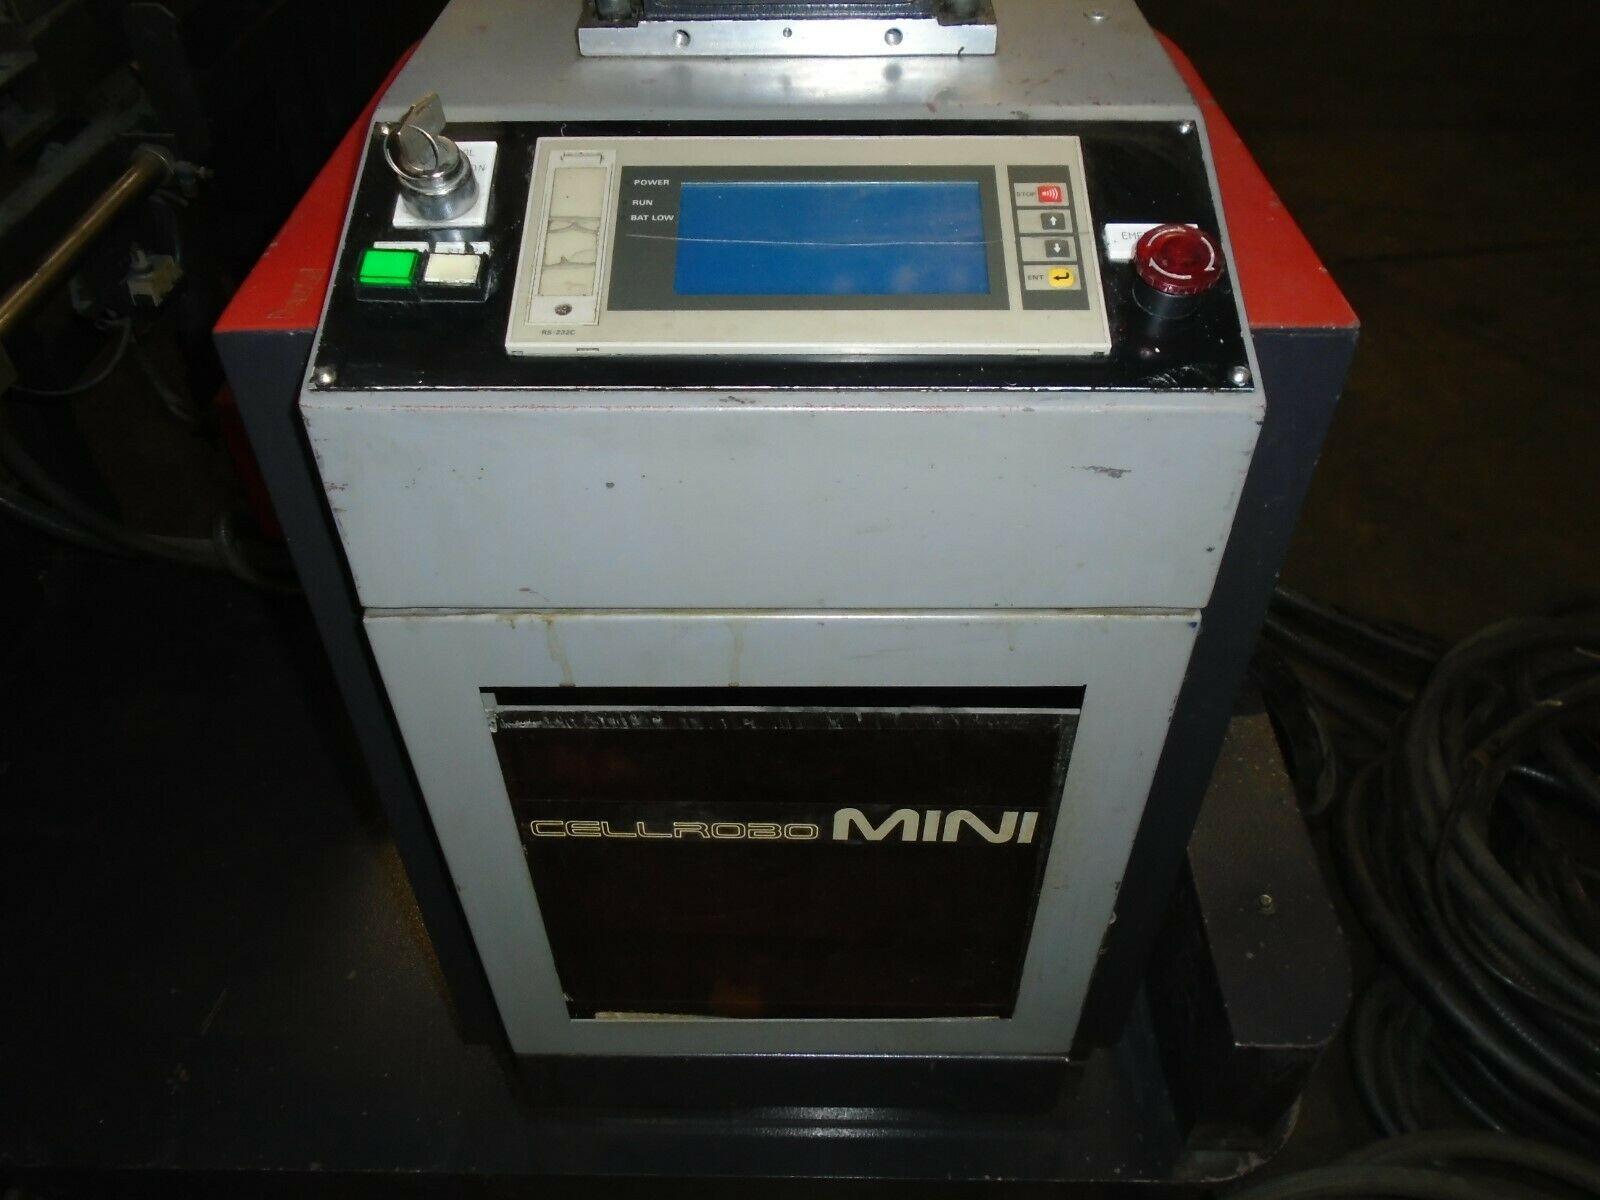 Fanuc Robot LR Mate 100 A5B-1131-8001 Mini Cel R-J2 Control - Image 5 of 12